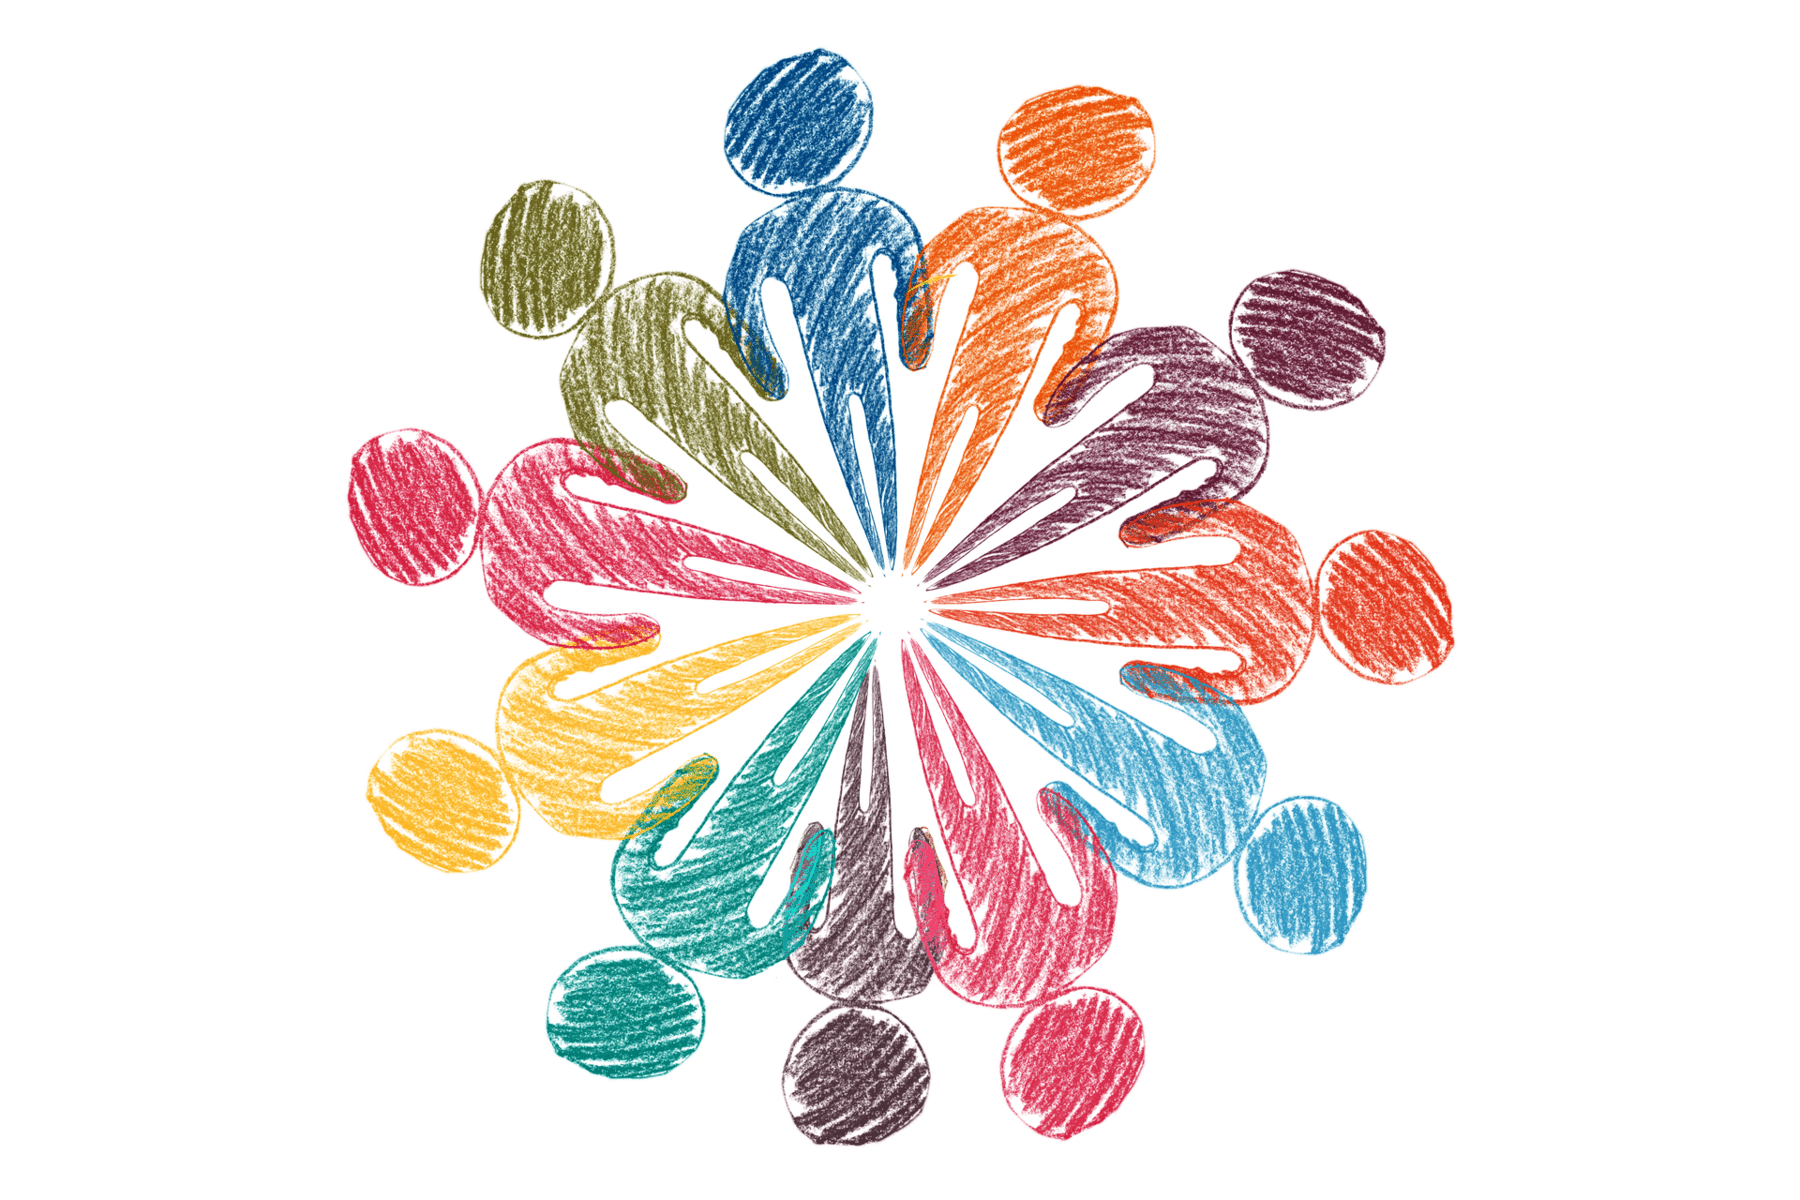 network 2 - pixabay, social-media-2457842_1920